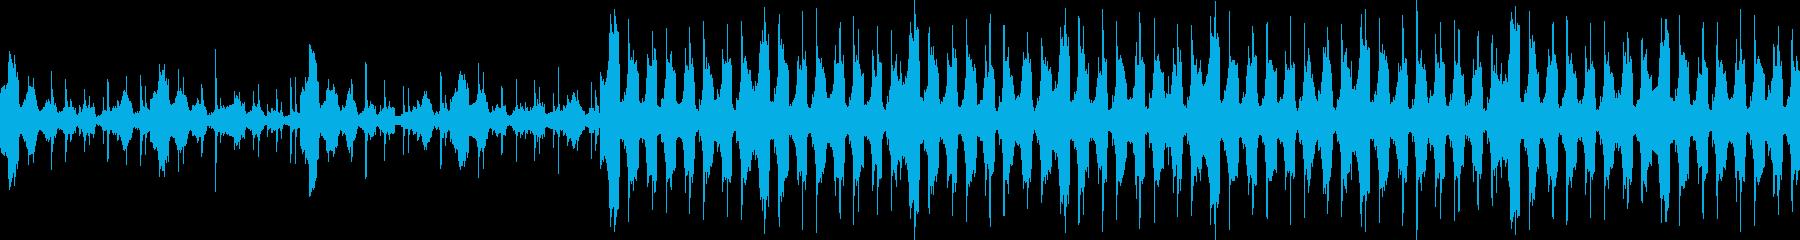 VP、CM、暖かい爽やかな透明感ループcの再生済みの波形